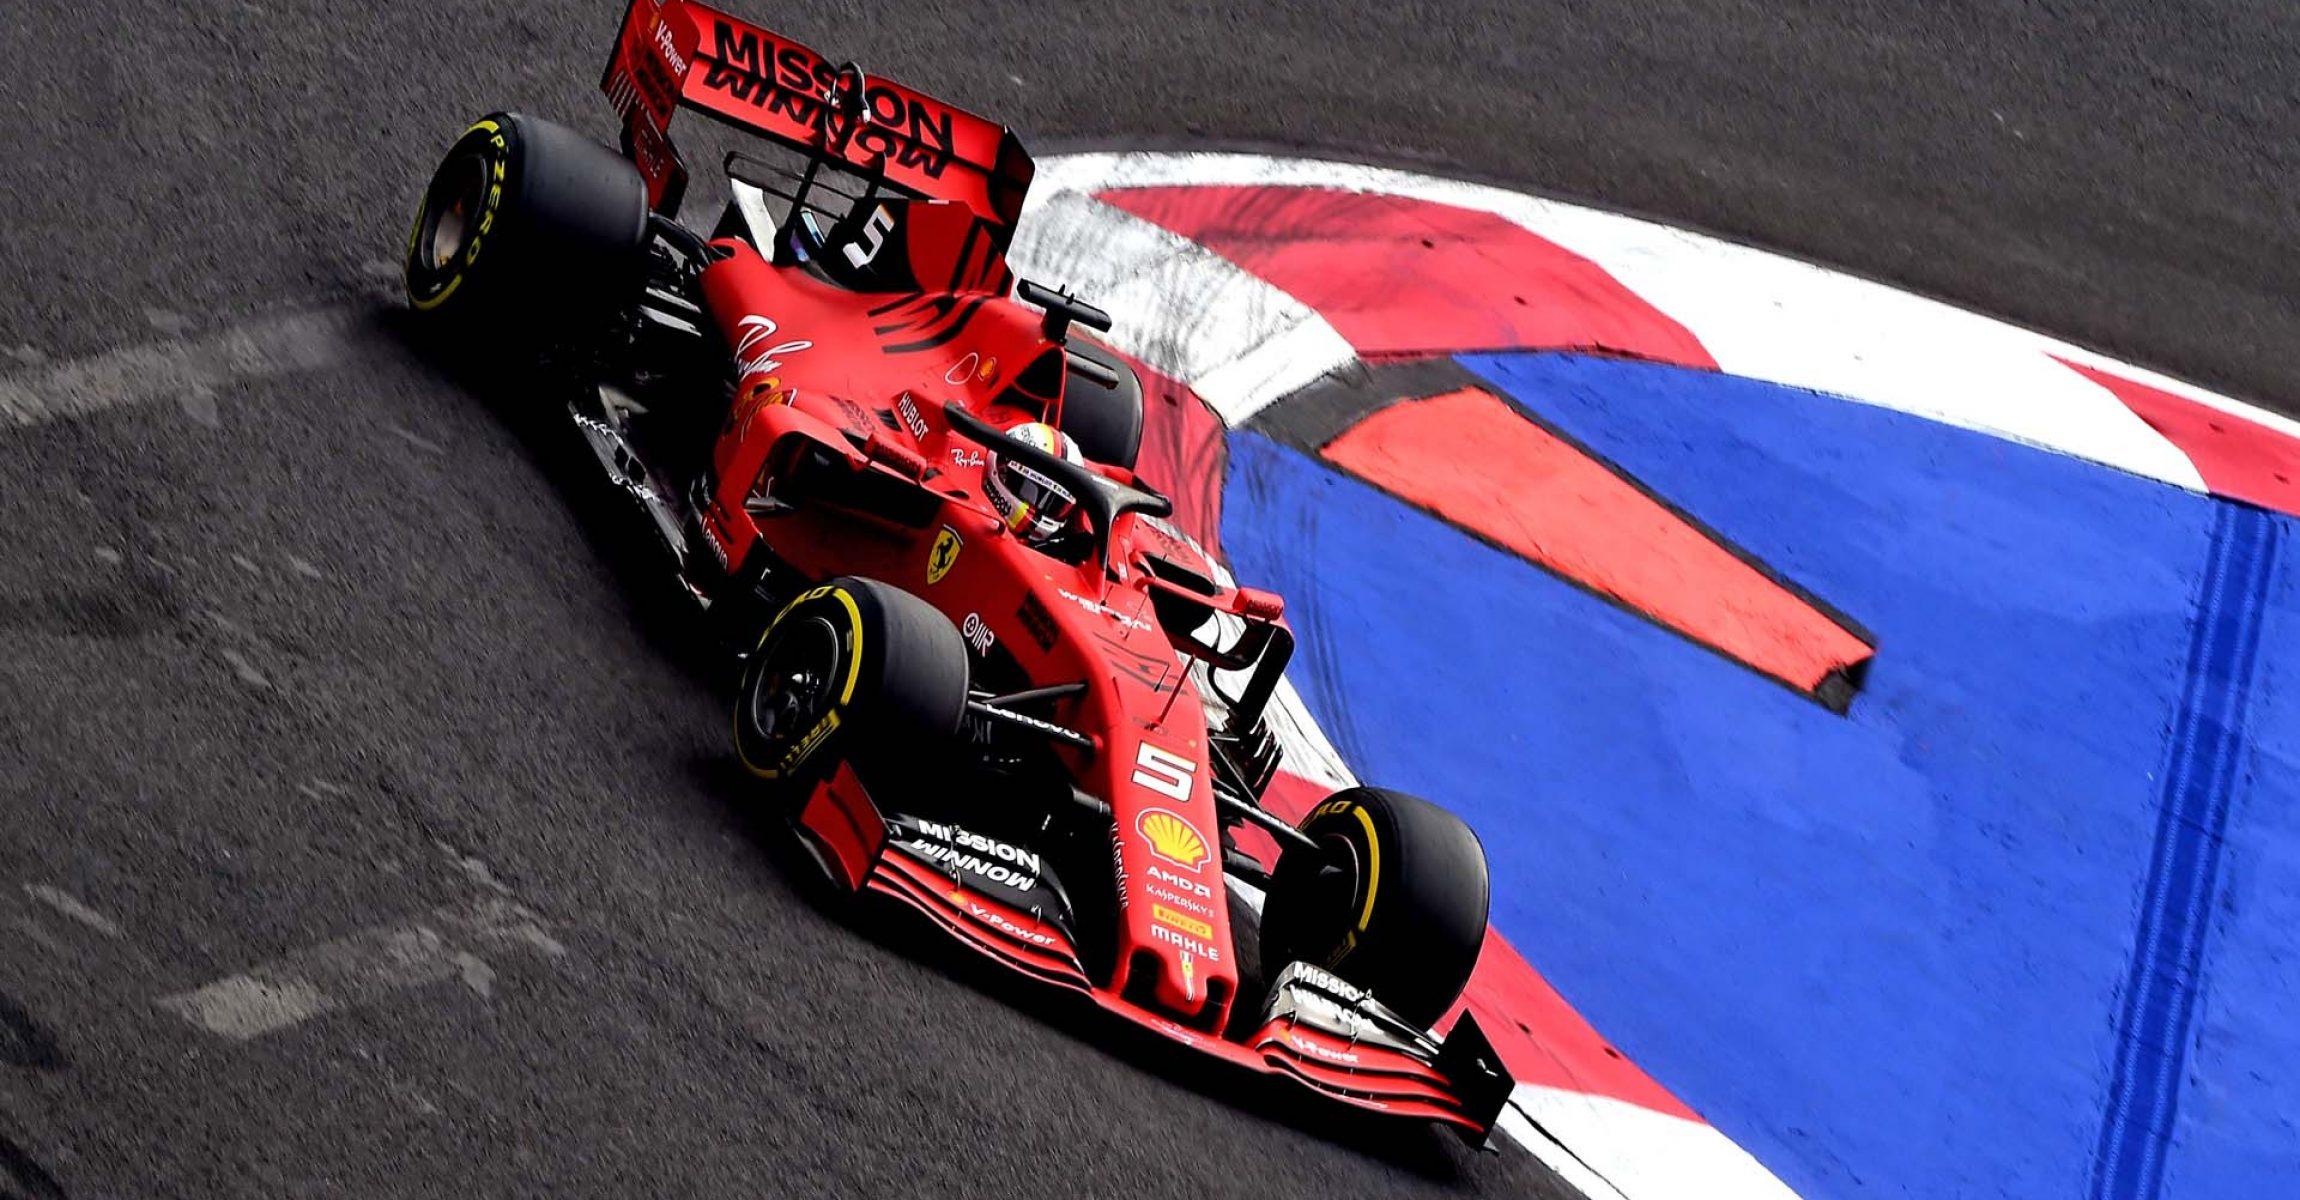 GP MESSICO  F1/2019 -  VENERDÌ  25/10/2019    credit: @Scuderia Ferrari Press Office Sebastian Vettel